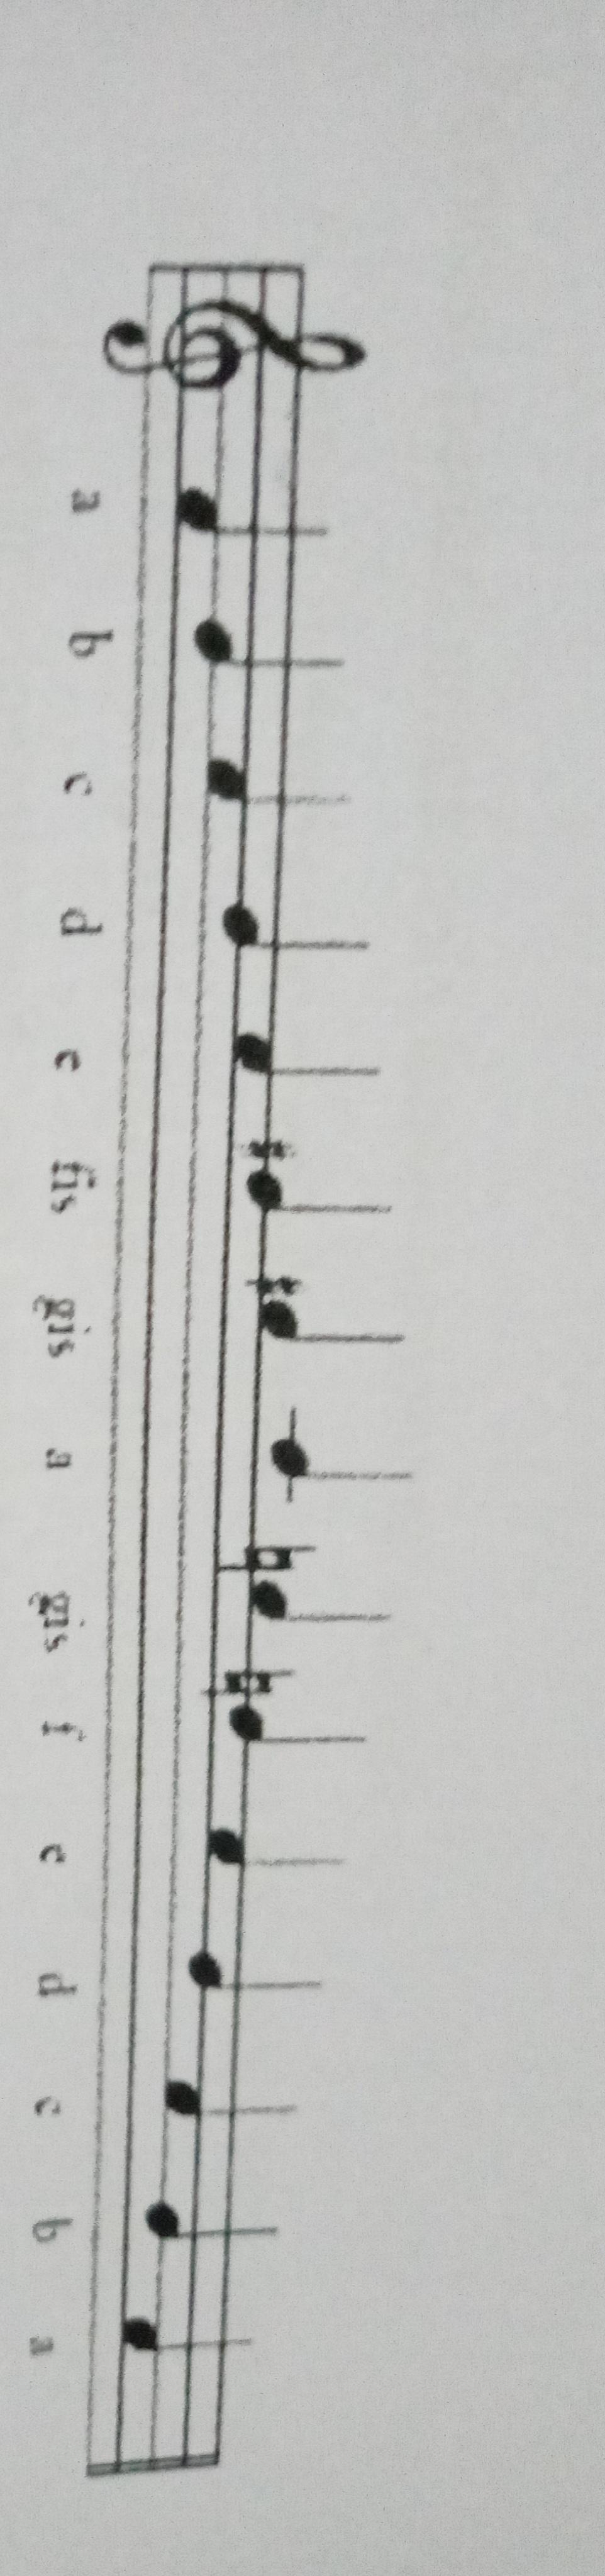 Tangga Nada Minor Melodis : tangga, minor, melodis, Perhatikan, Tangga, Berikut, Tempat, Gambar, Jenis, Adalah, Minor, Brainly.co.id